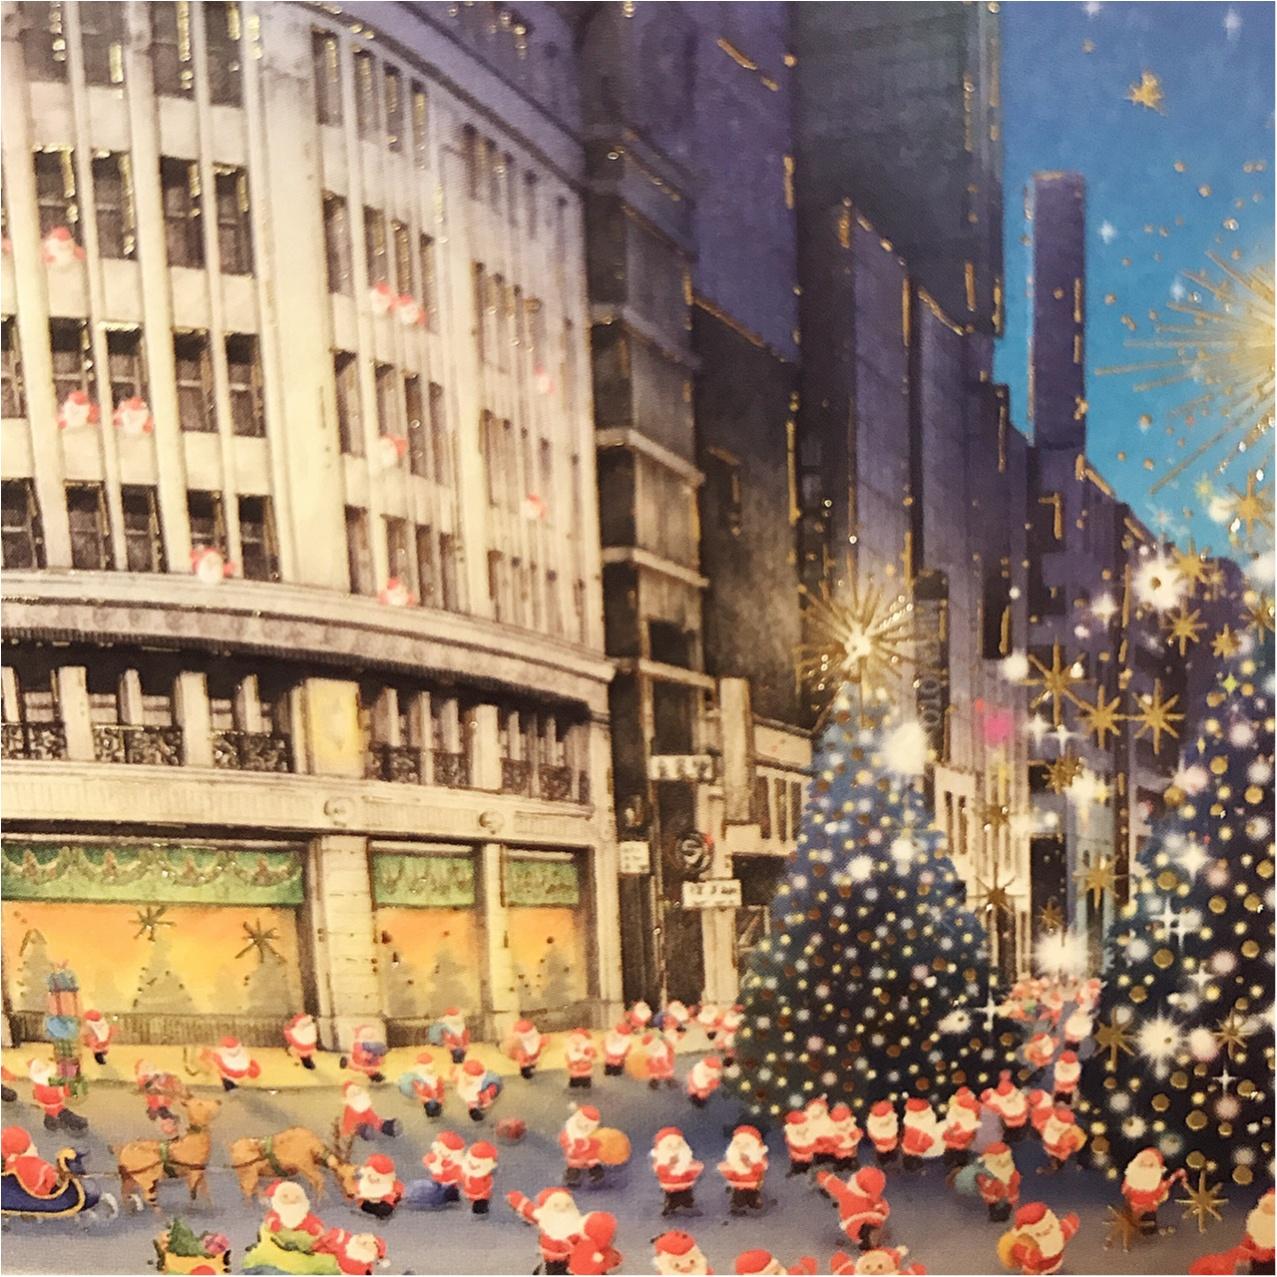 《Xmasプレゼントに添えて♡》 日本を旅するサンタさんが可愛いクリスマスカード❤︎_5